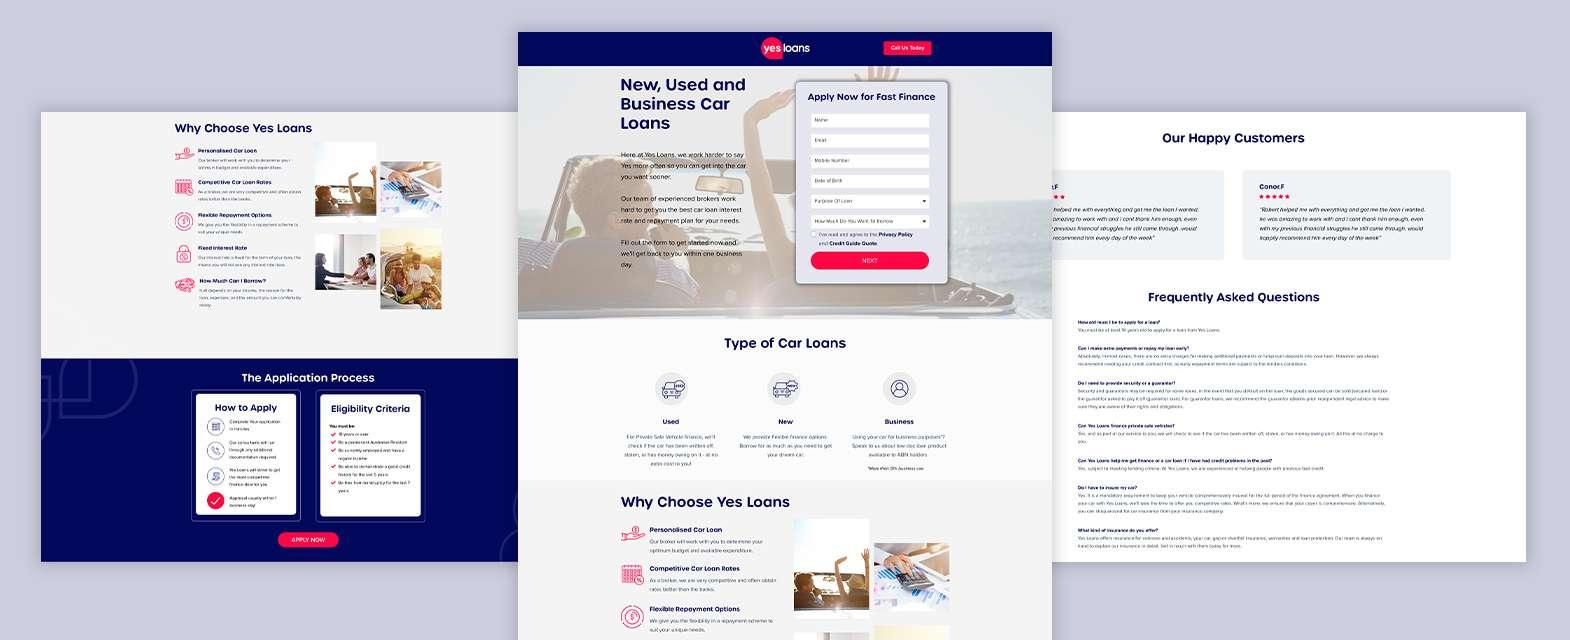 Yes Loans Digital Marketing Solution